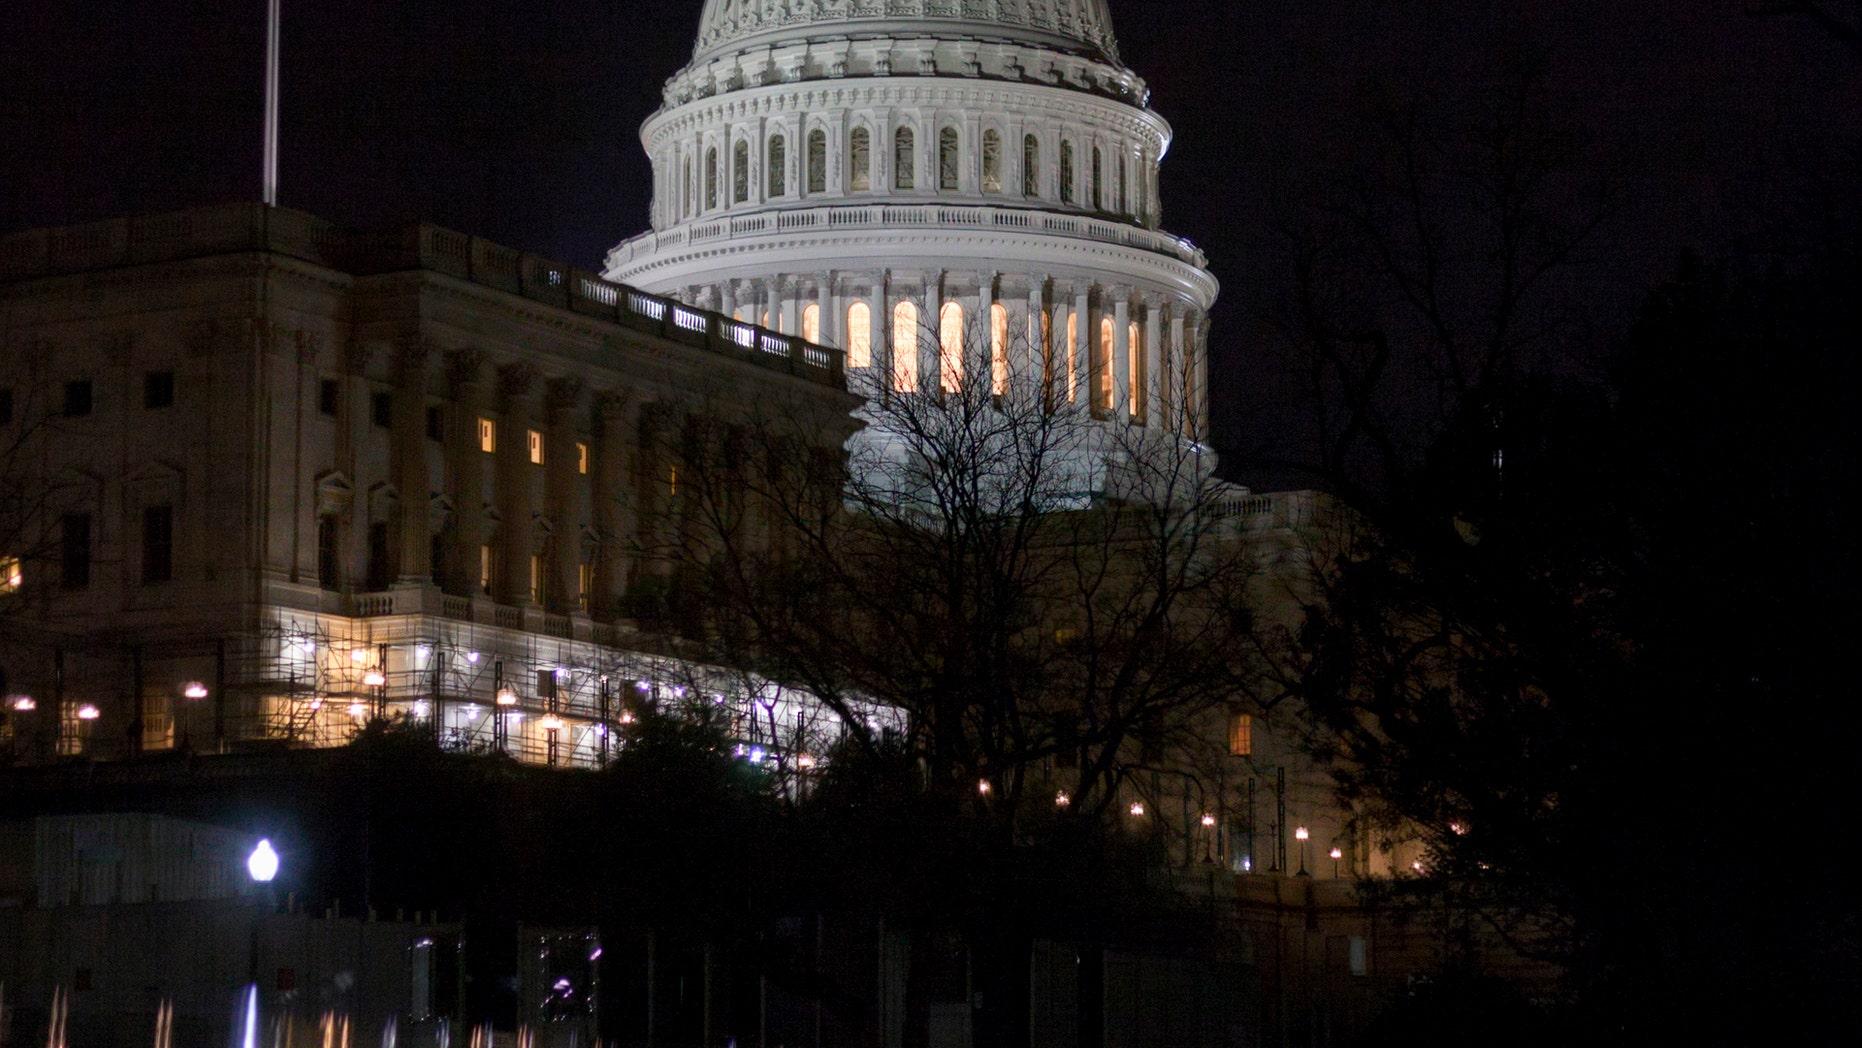 U.S. Capitol at night.